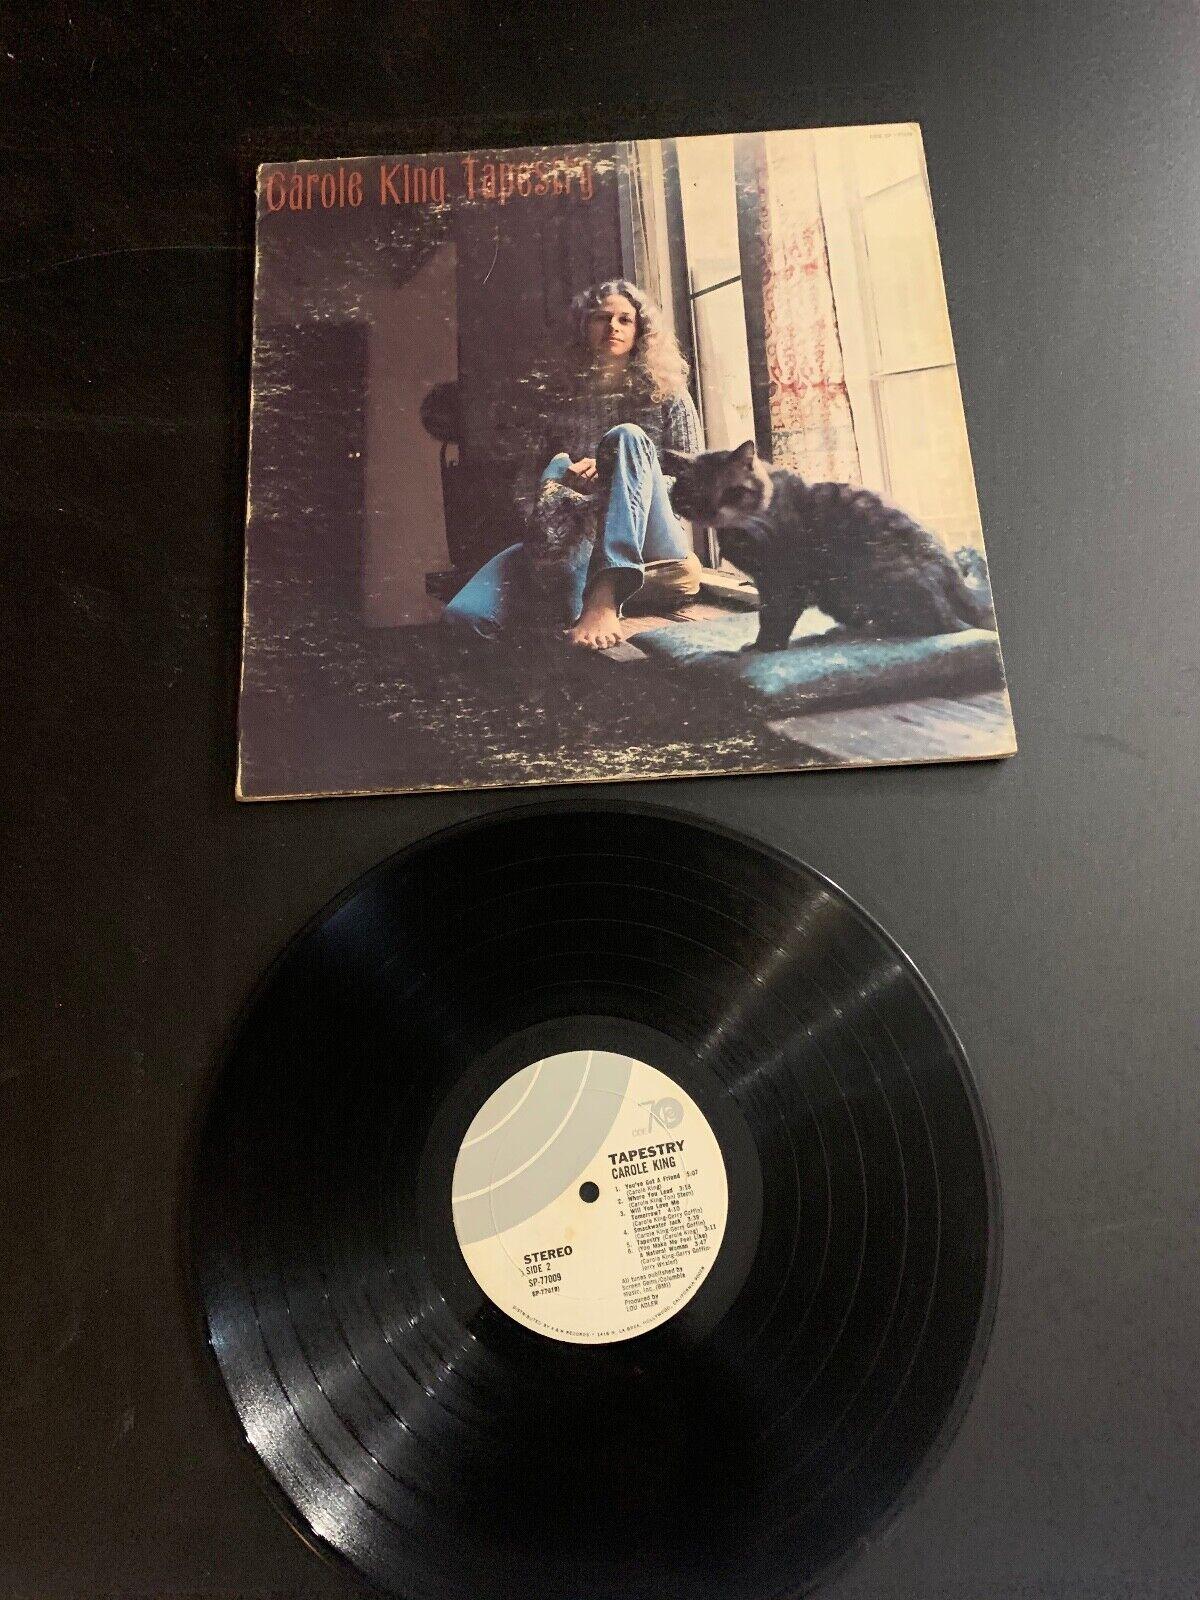 LP RECORD - CAROL KING - TAPESTRY - A M RECORDS - $9.99